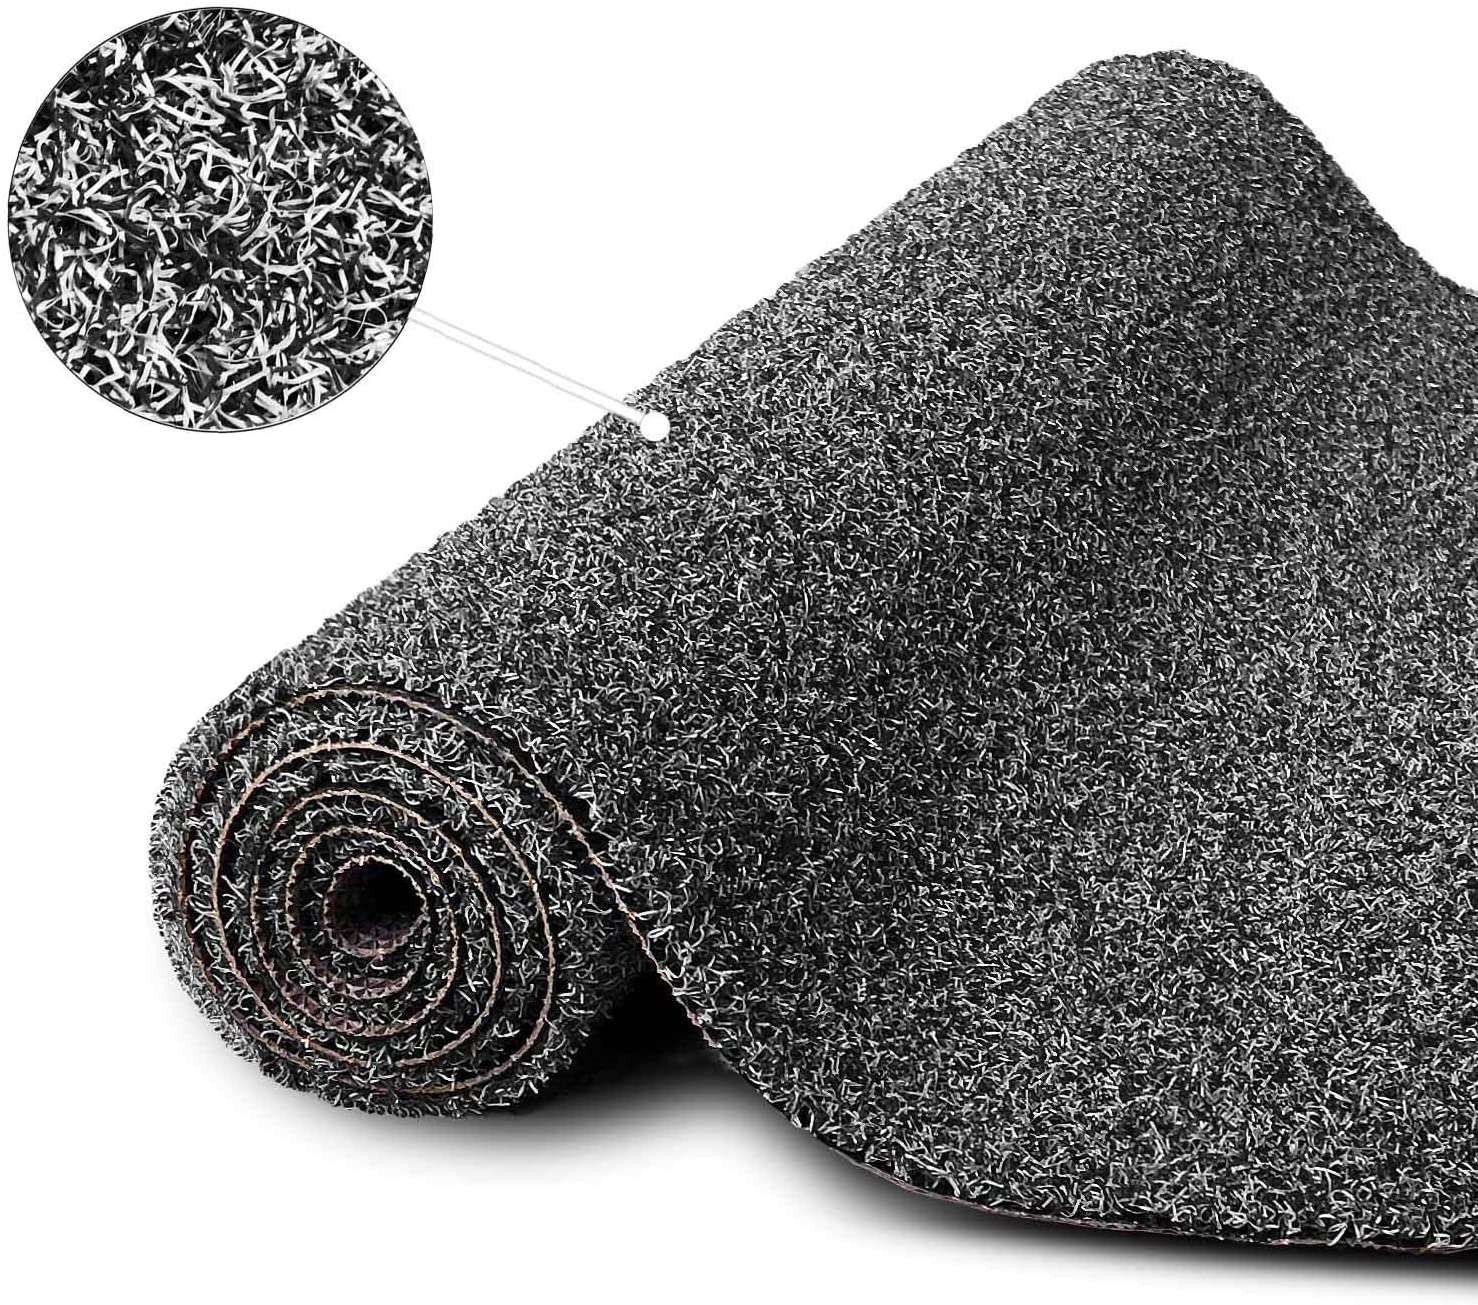 TOPKULL Outdoor Doormat with Heavy-Duty PVC Backing,Home Front Doormat Non-Slip Waterproof,Low Profile Outdoor Mat for Entry,Easy Clean(23X16, Black)